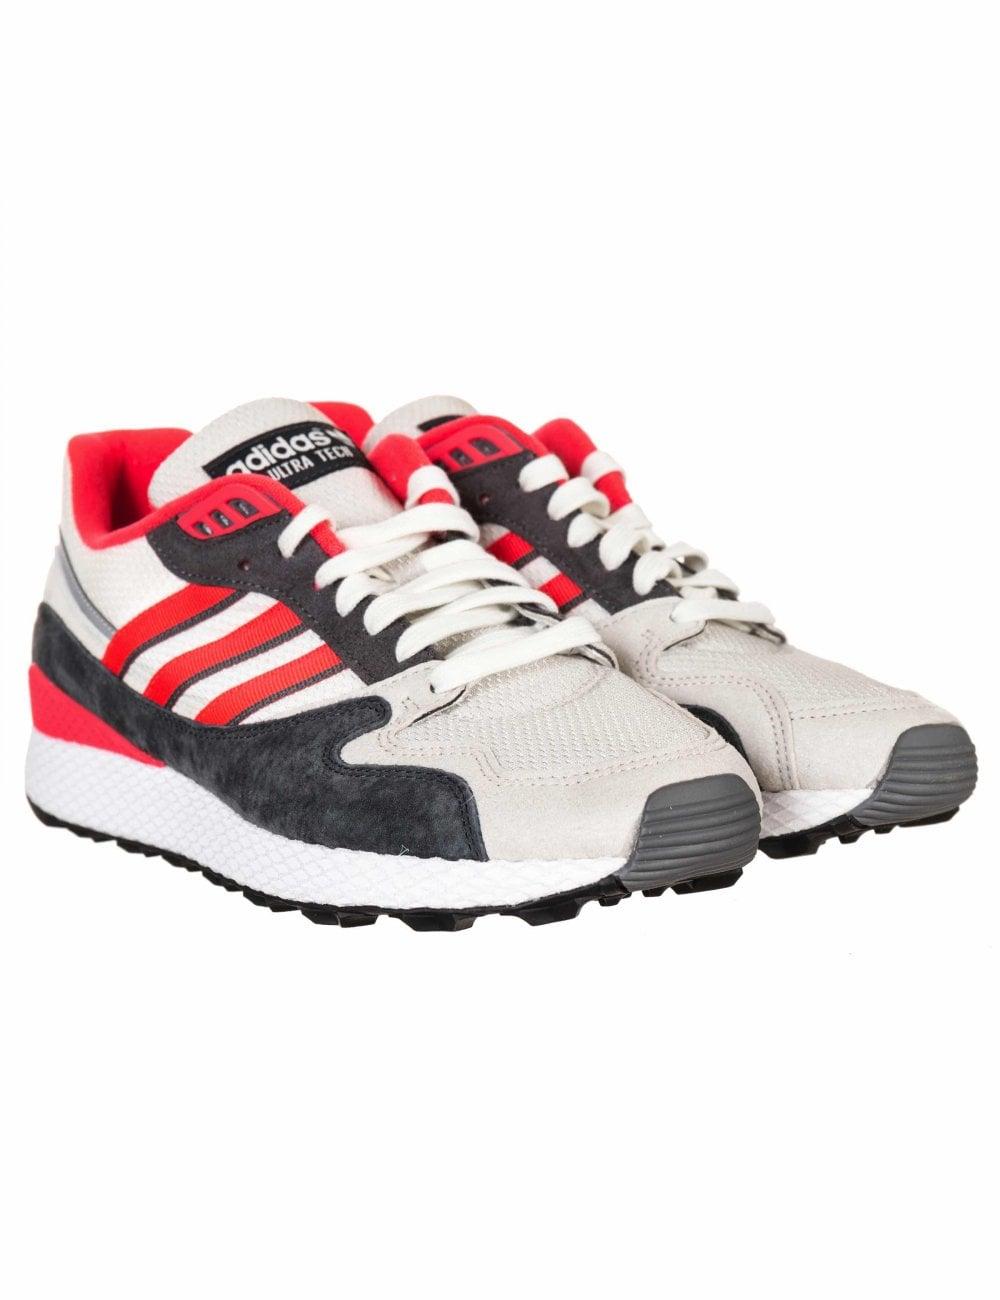 sale retailer 1d40d ef0c6 Adidas Originals Ultra Tech Trainers - Raw White Shock Red